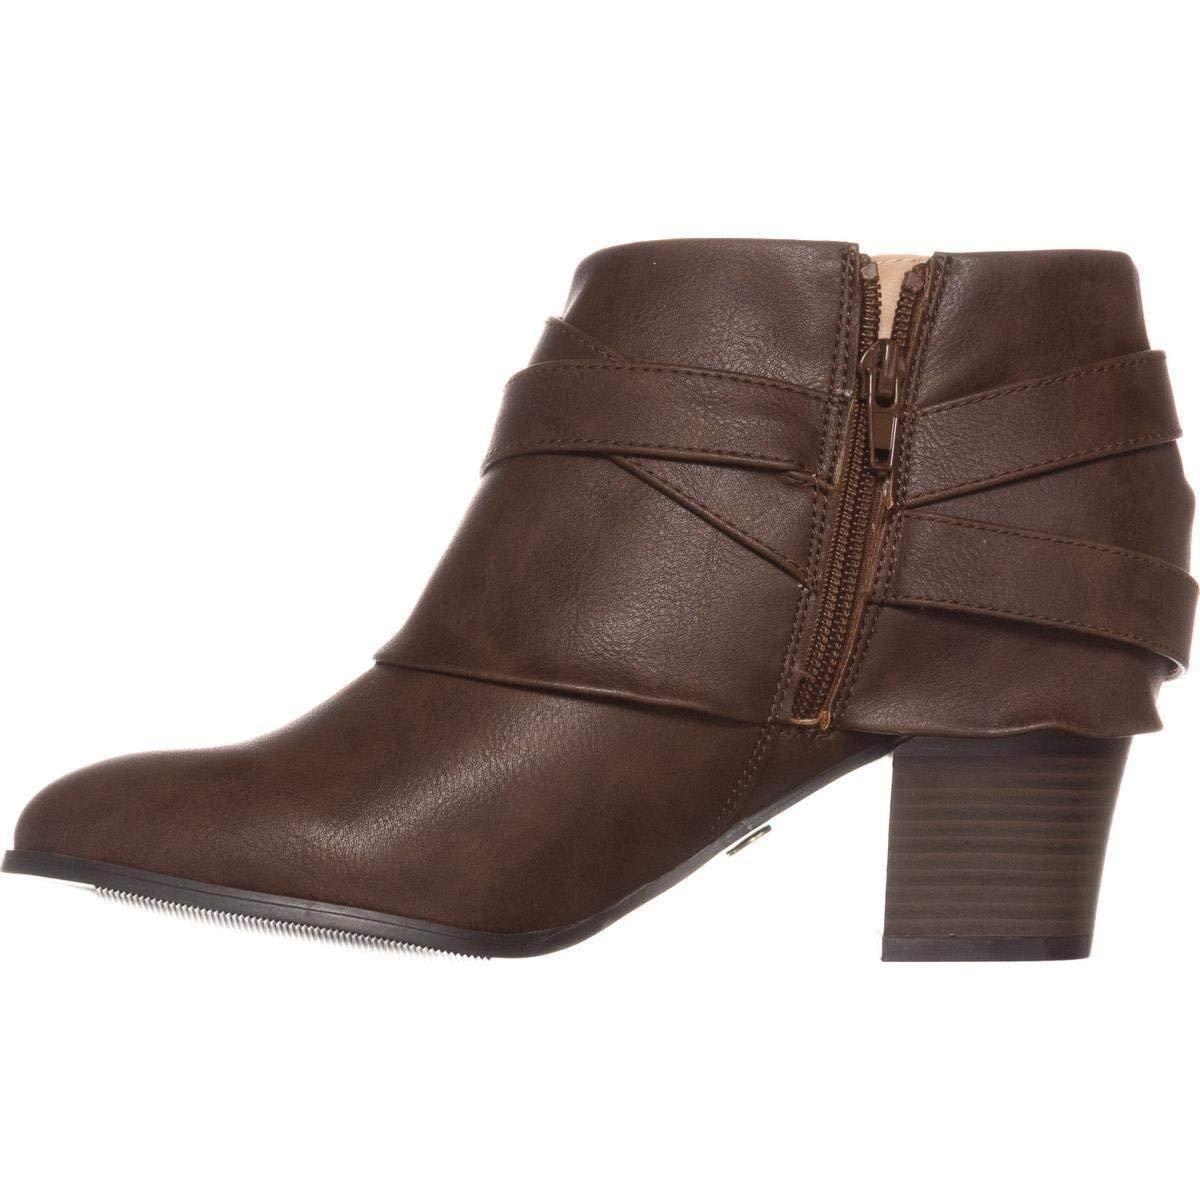 Thalia Sodi Sodi Thalia TECA, Fashion Stiefel Frauen, Geschlossener Zeh Braun 3bdb2e